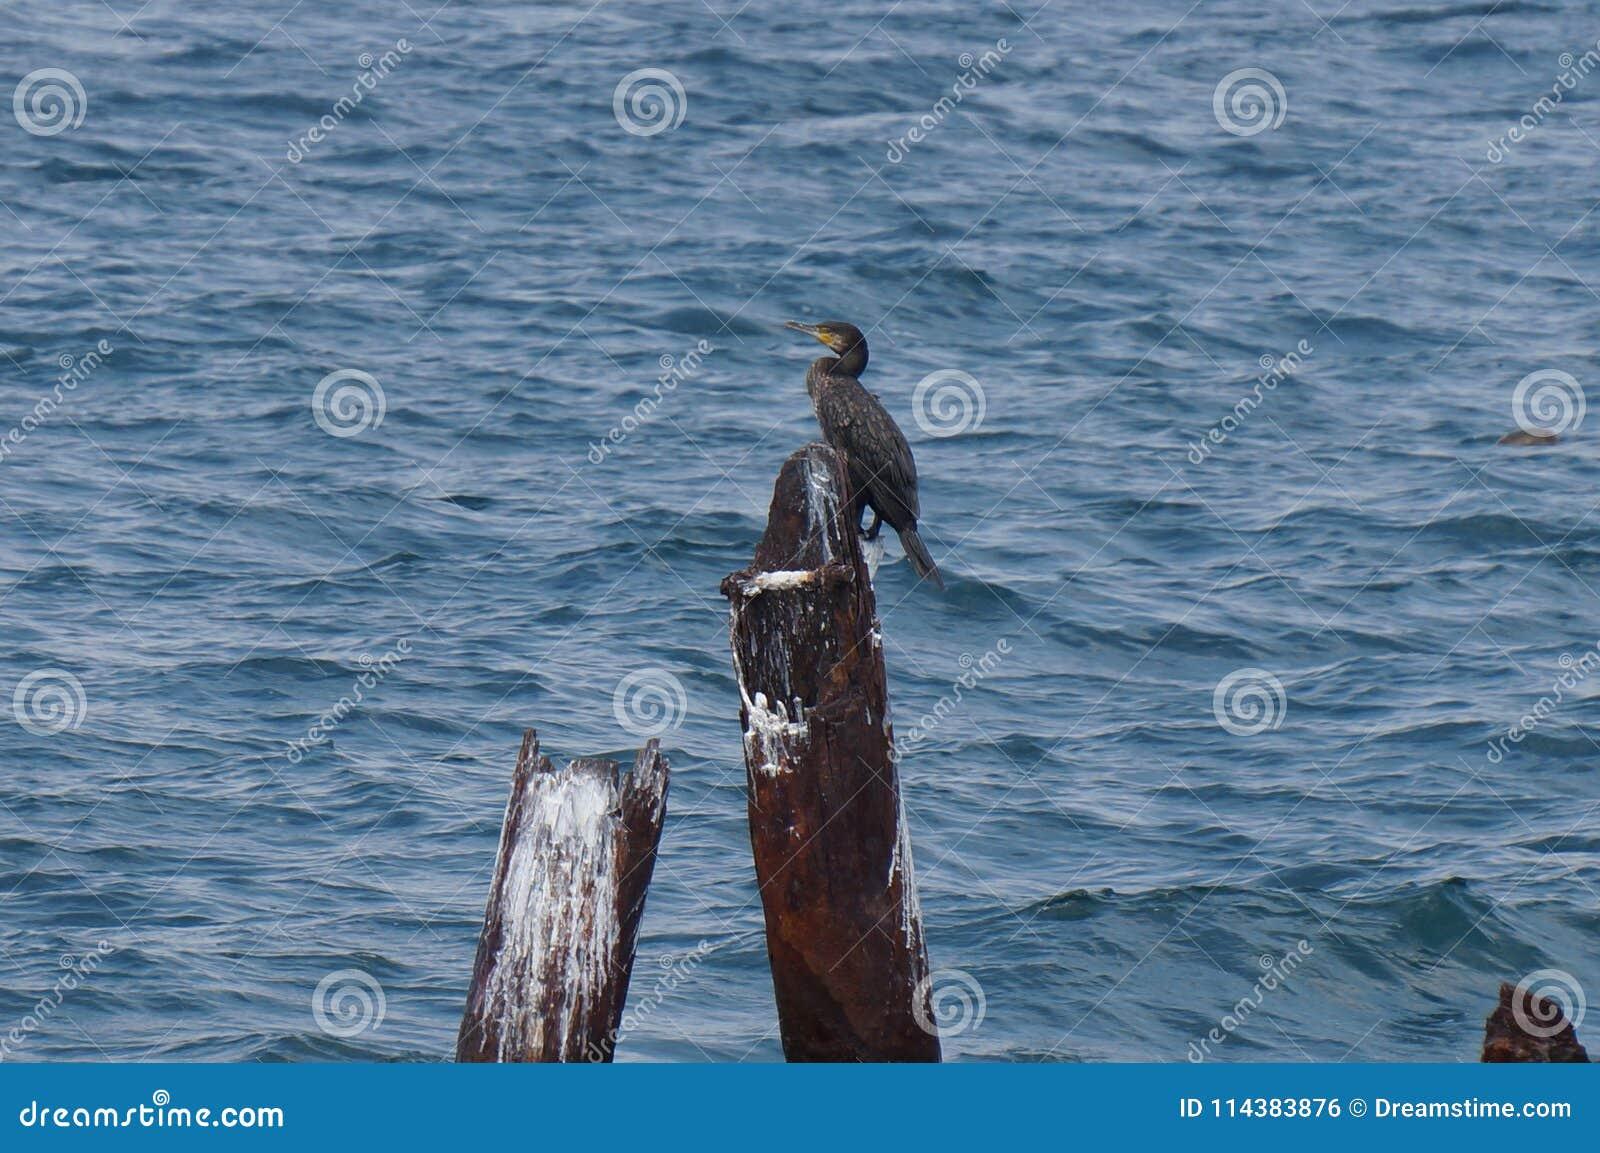 Duży kormoran samotnie